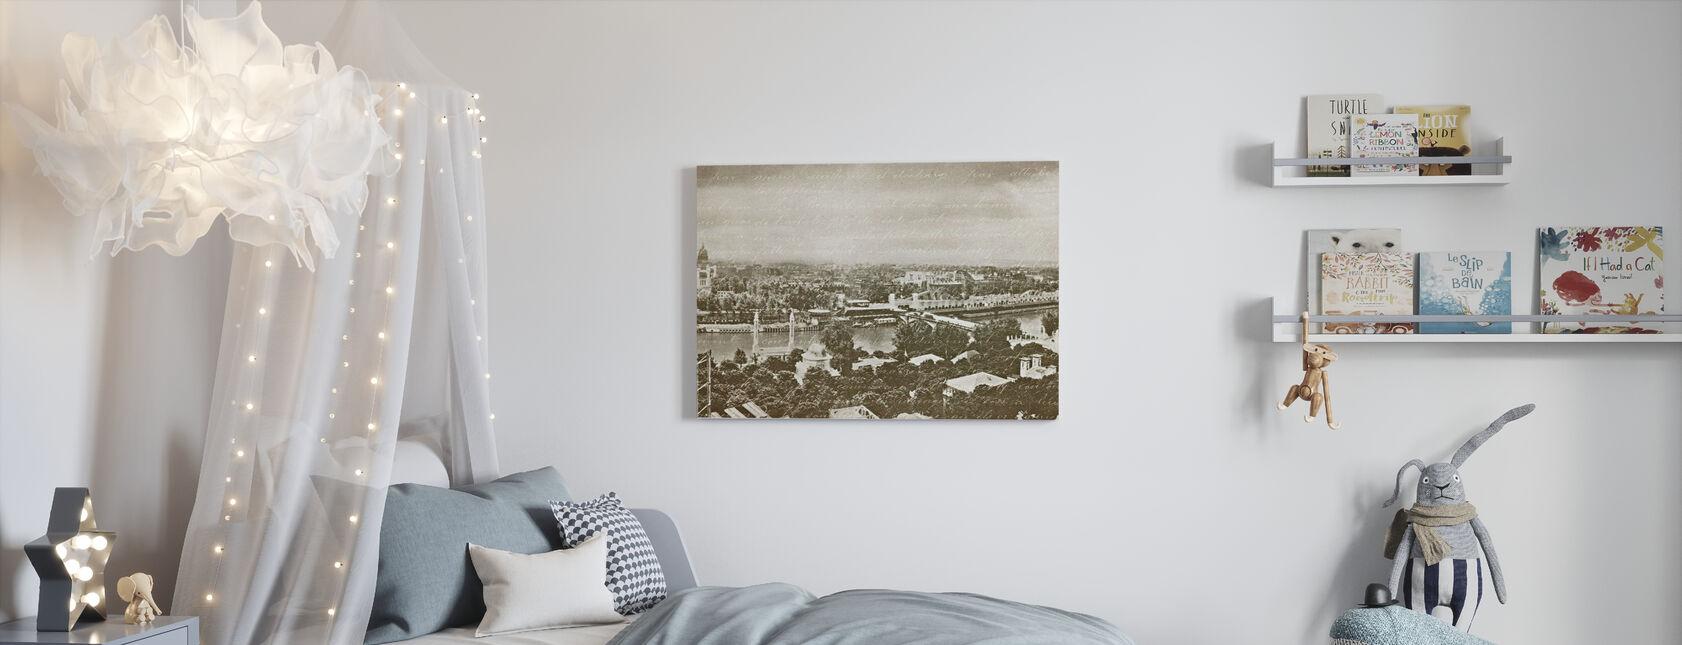 Pariisin Panorama - Canvastaulu - Lastenhuone